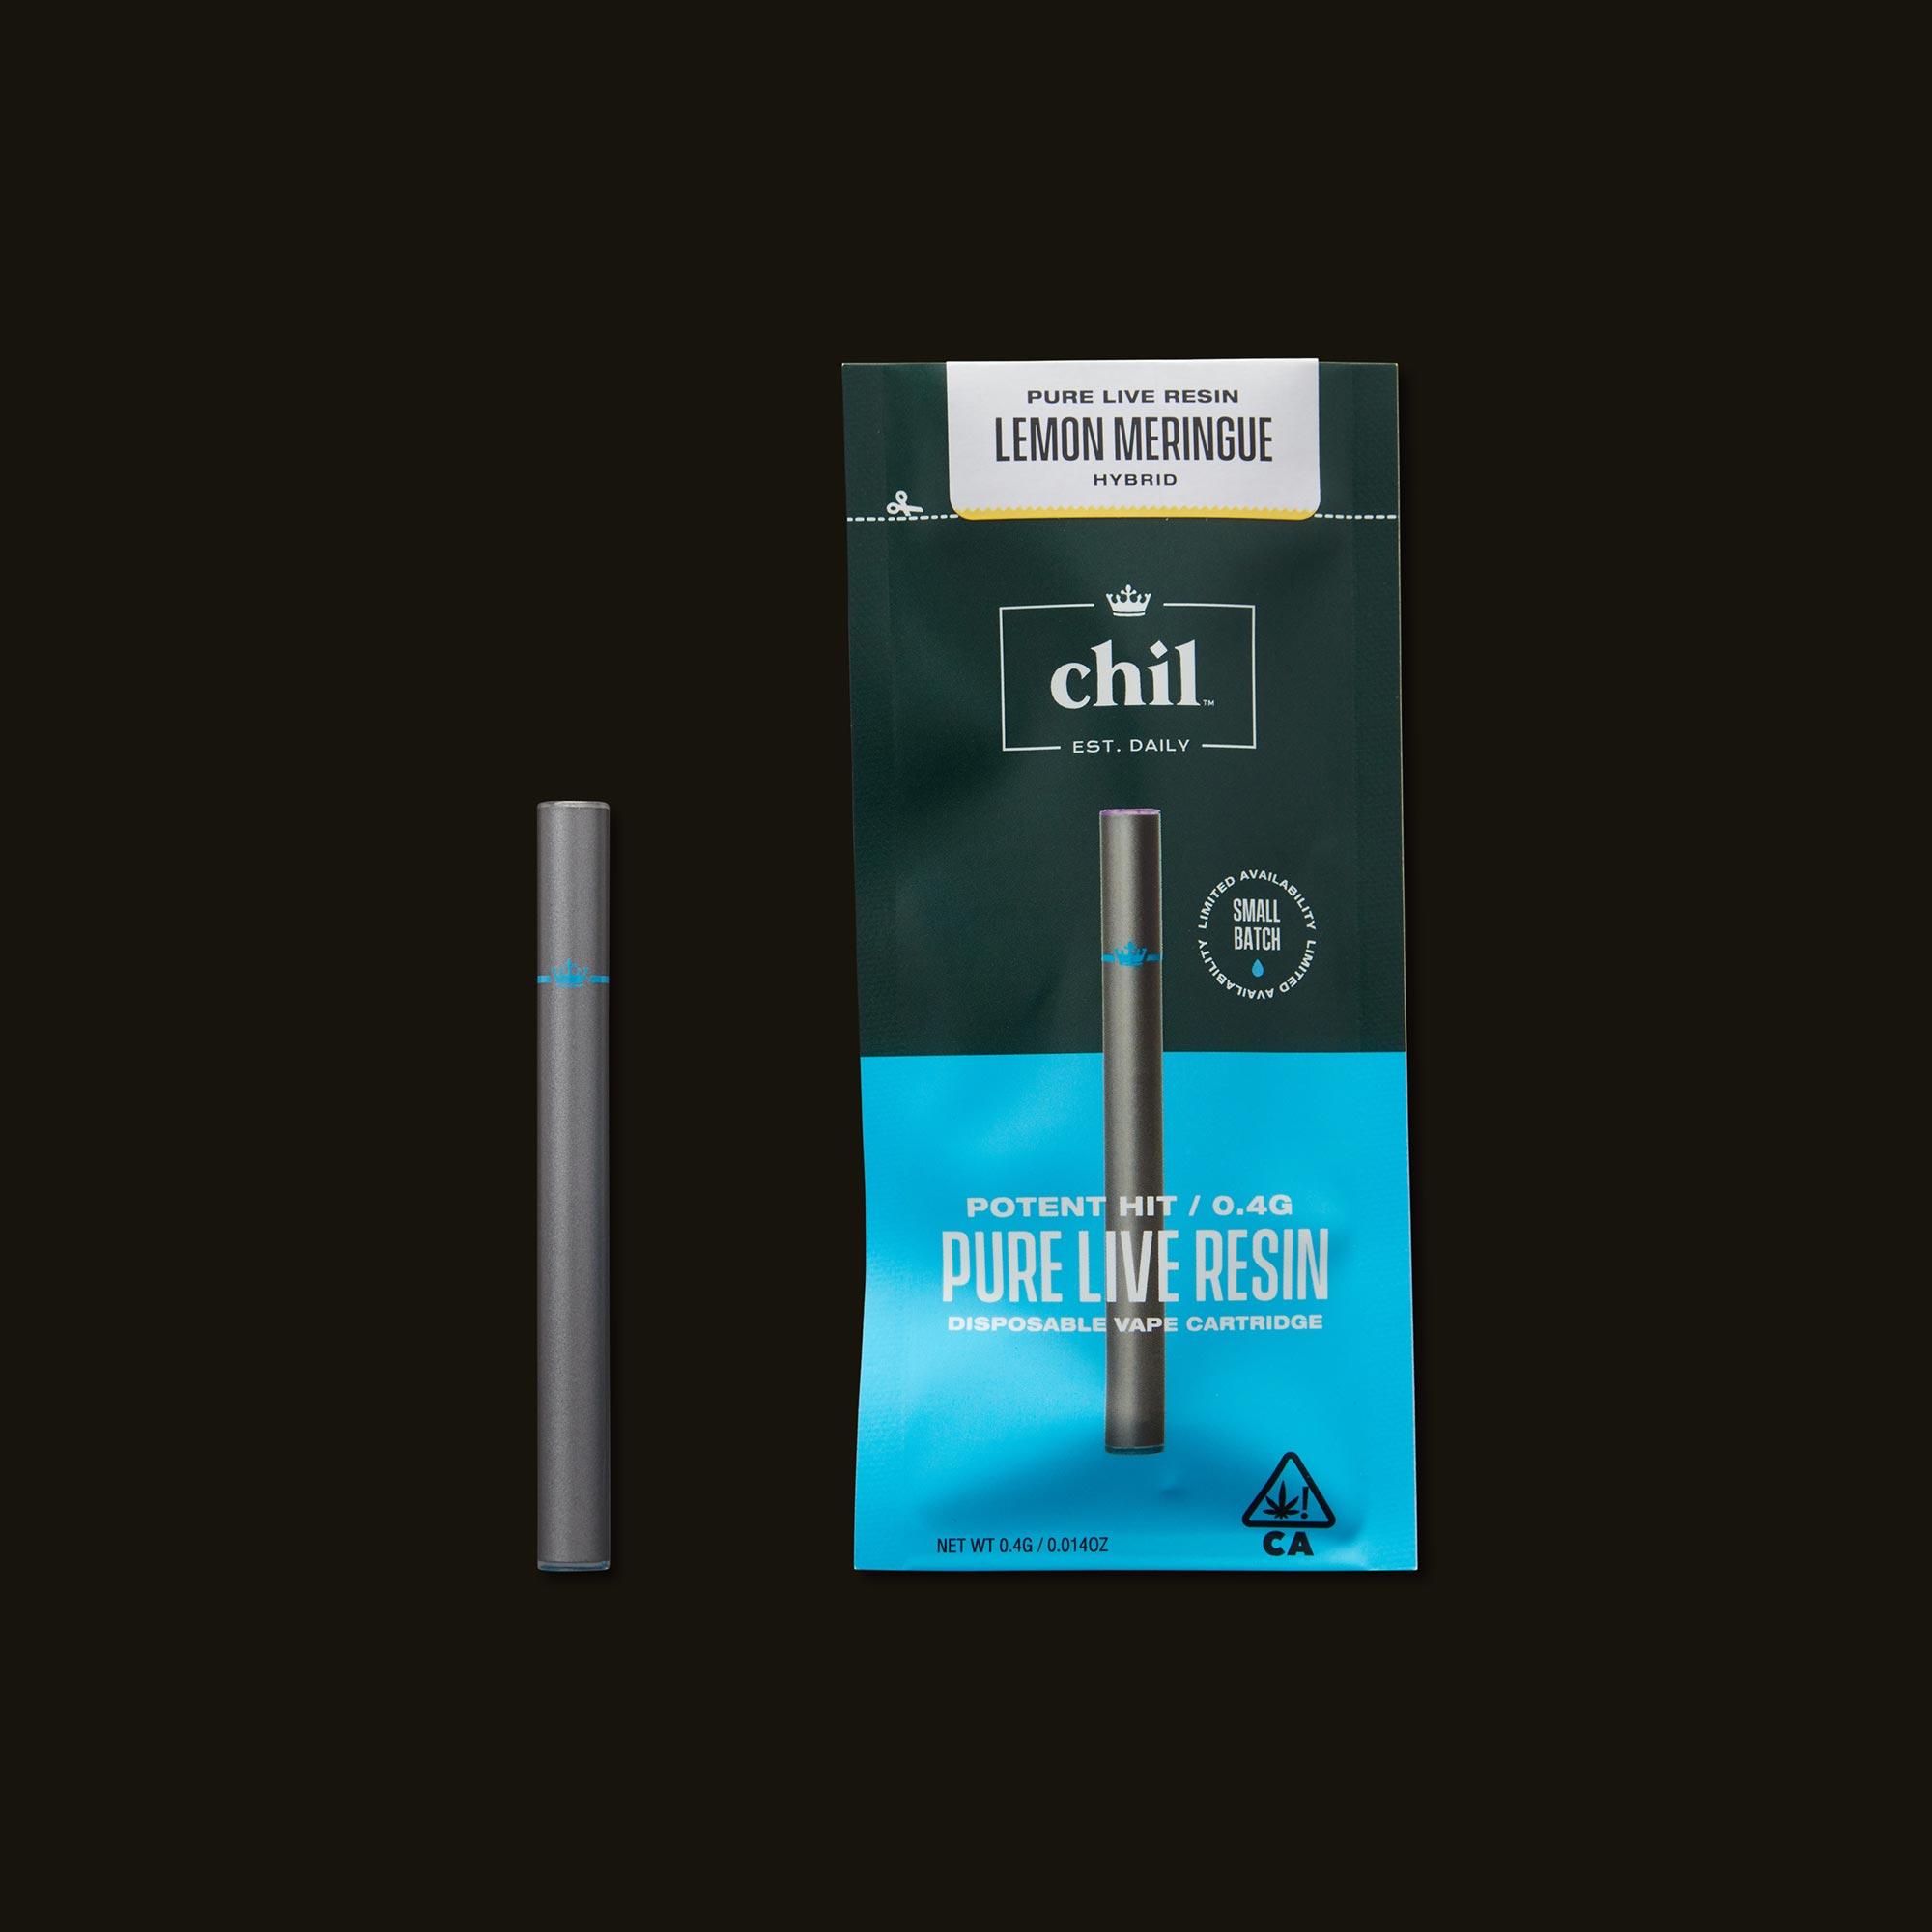 Chil Lemon Meringue Pure Live Resin Disposable Vape Pen with Packaging